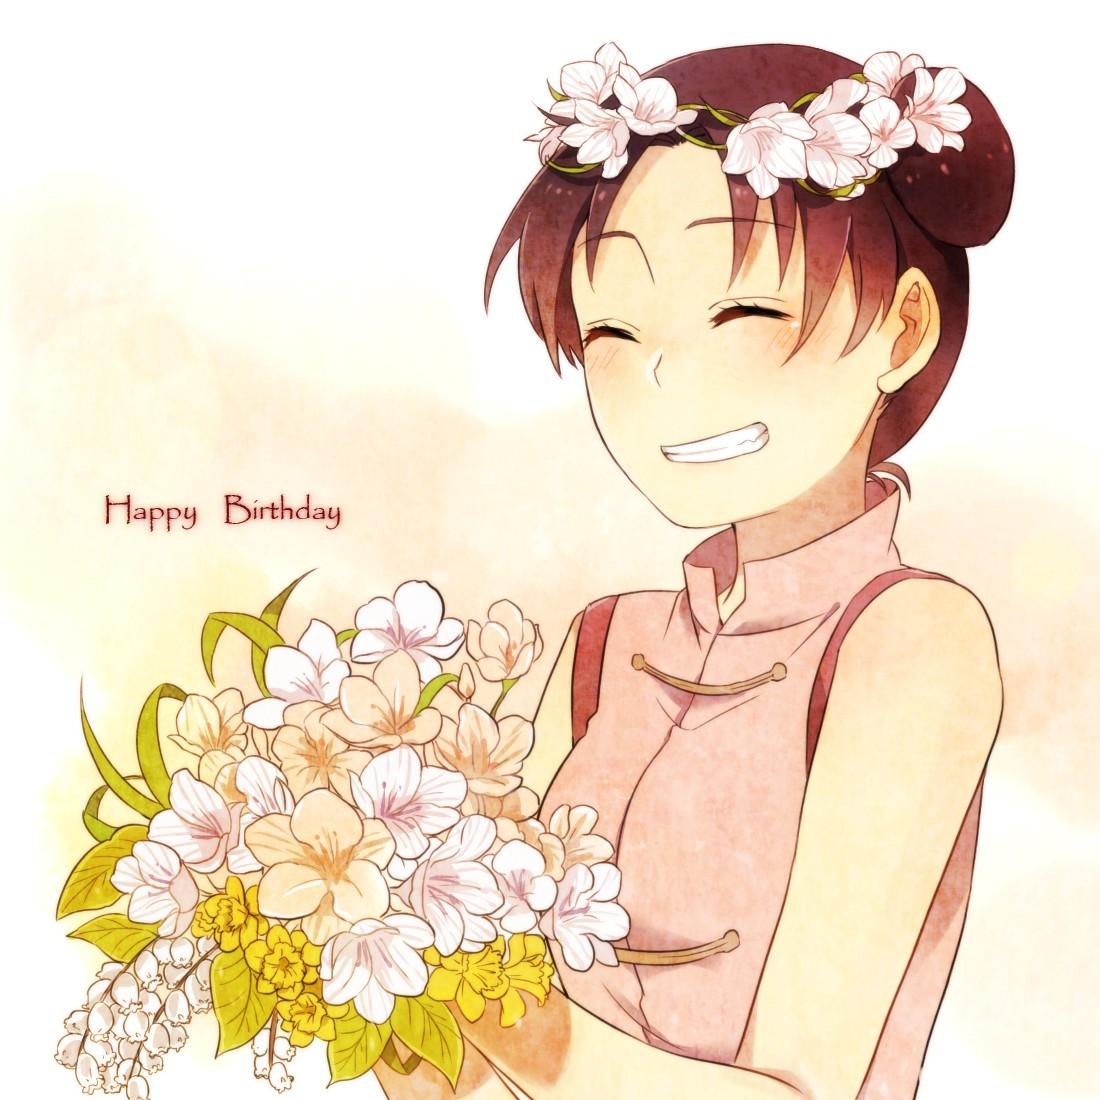 Anime Characters July Birthdays : Tenten naruto image zerochan anime board